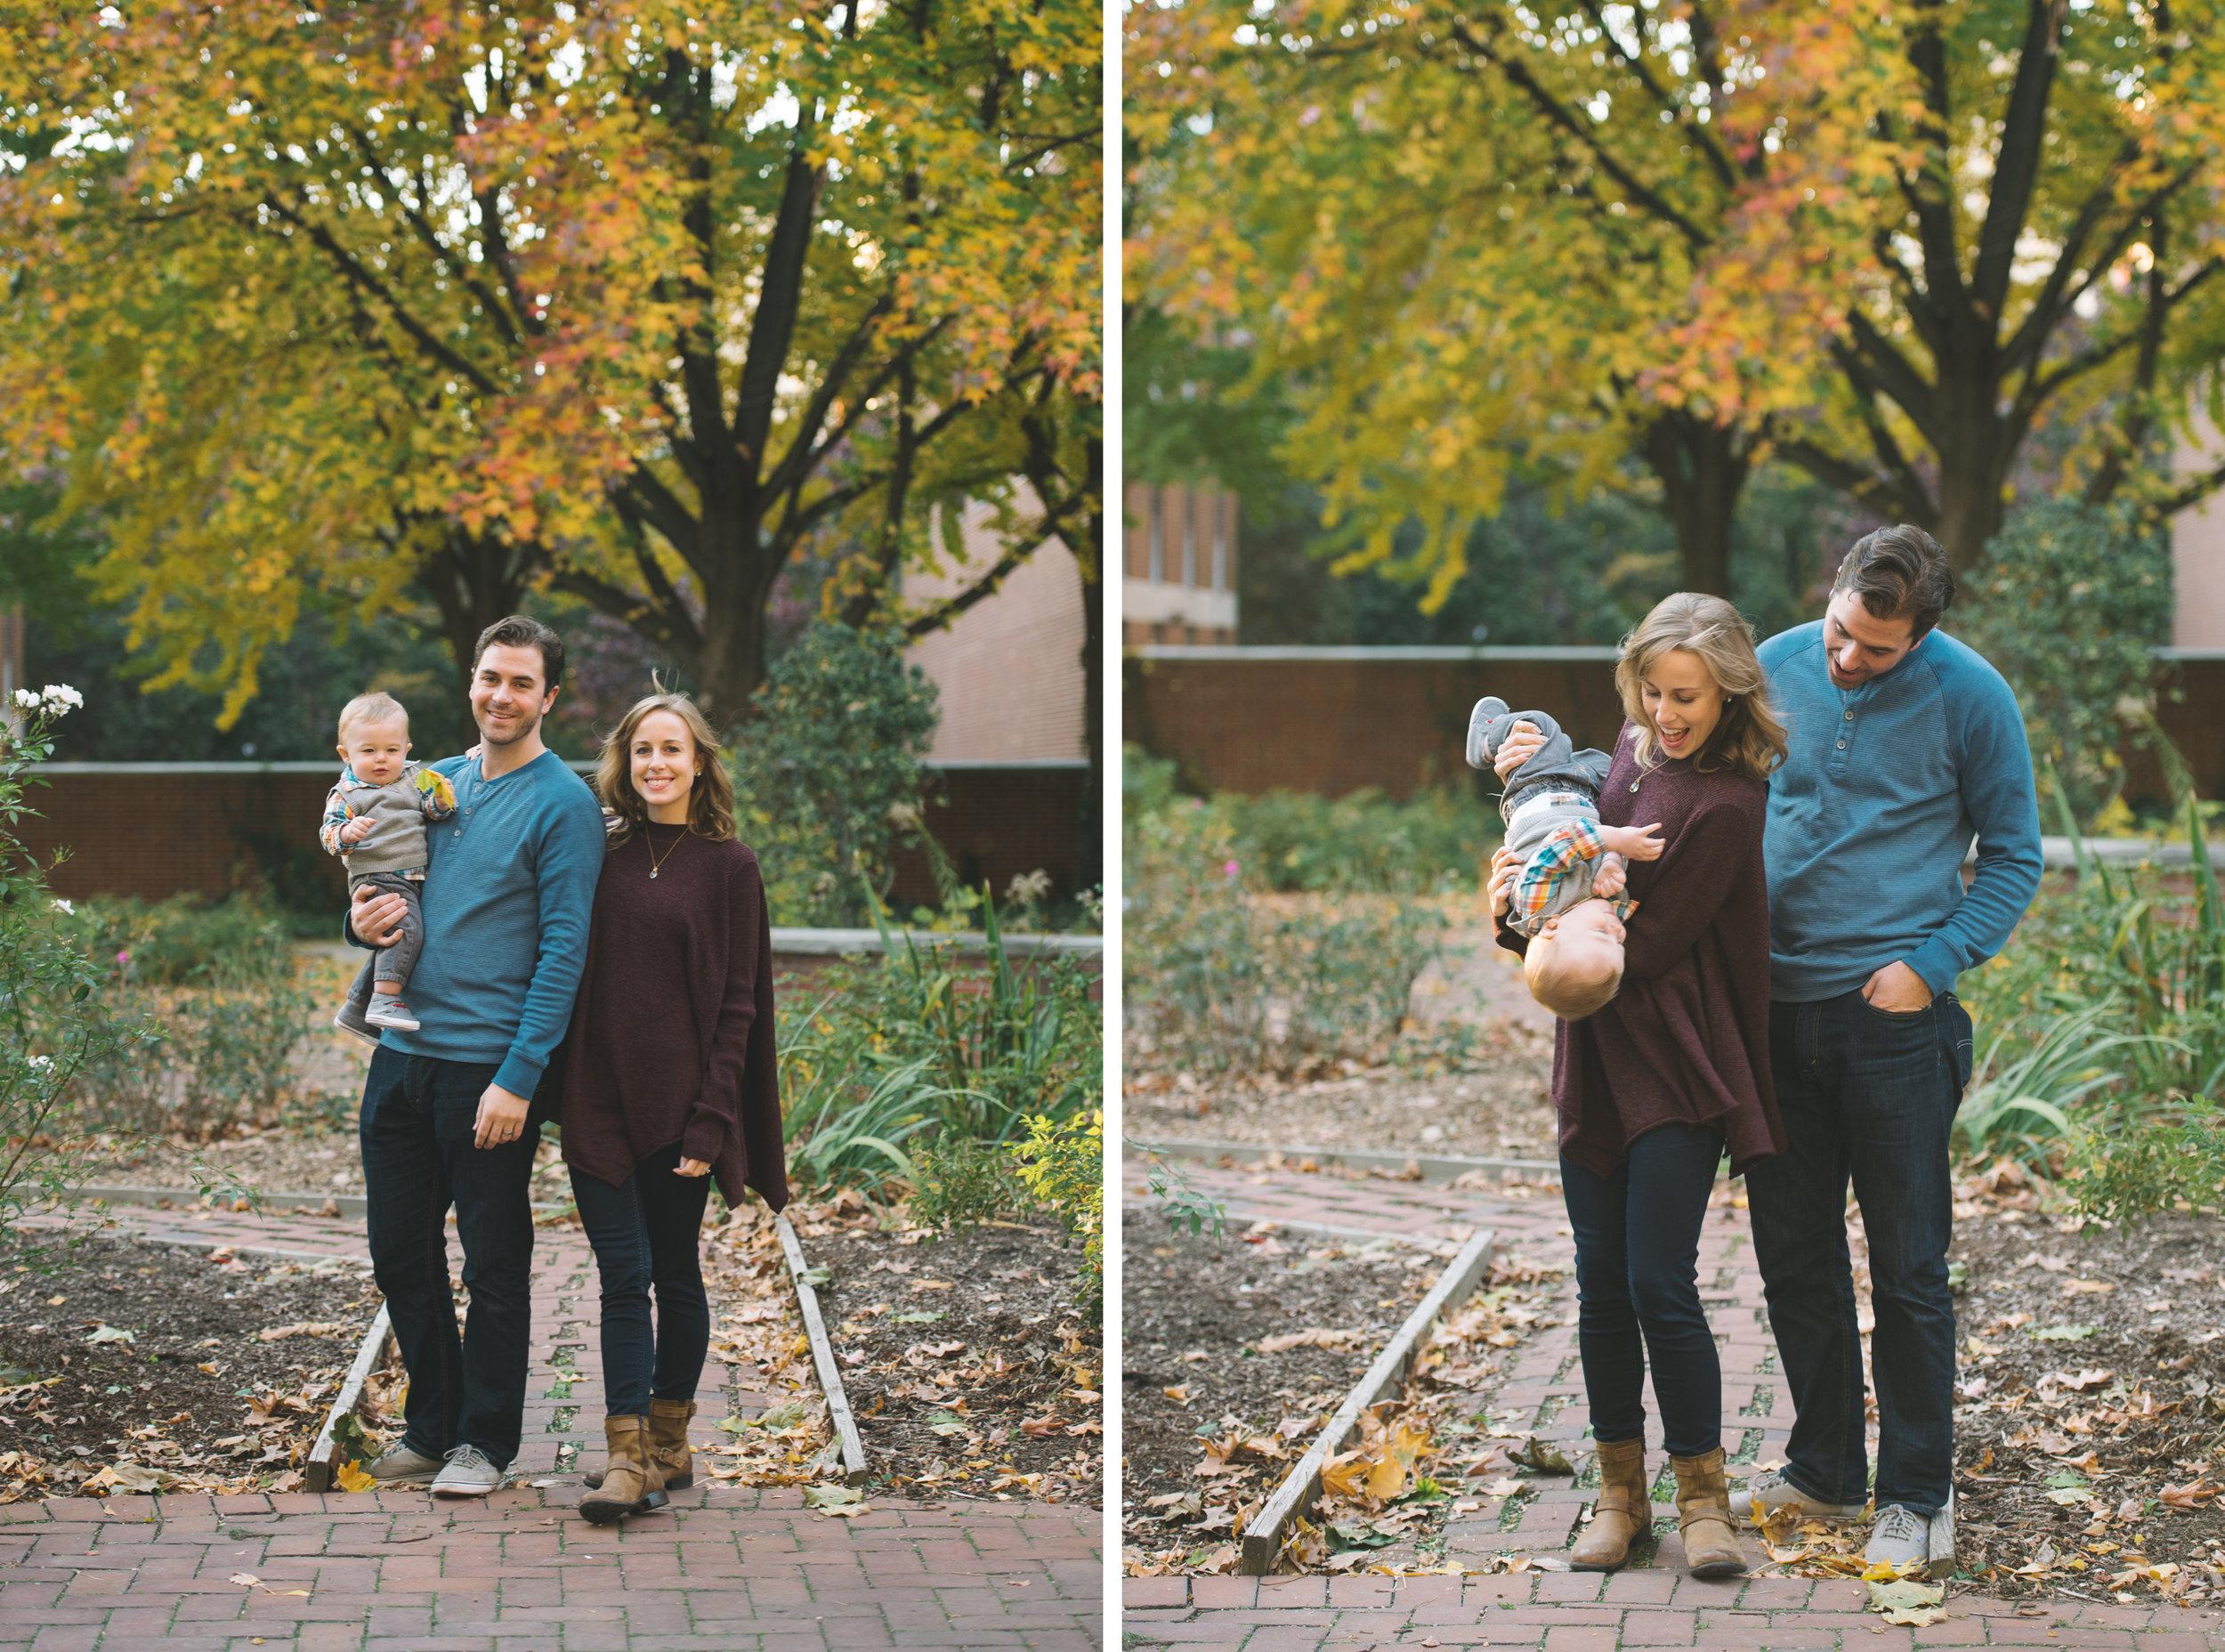 Peaberry-Photography-Philadlphia-Family-Portraits-016.jpg